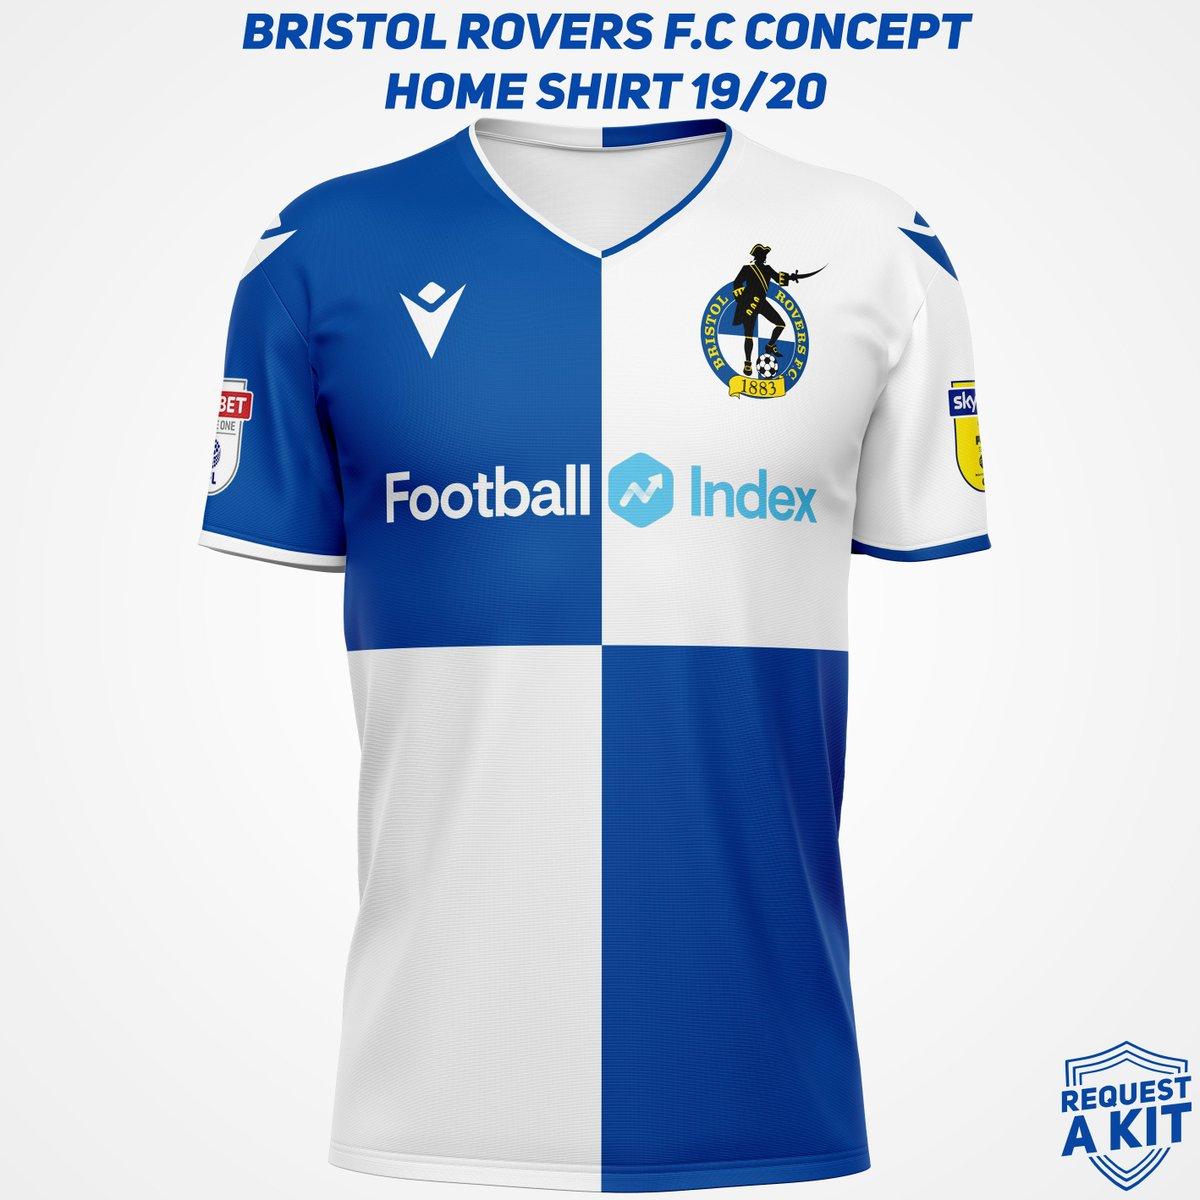 07f8fa769 ... Download for your Football Manager save here!   https   www.mediafire.com file rxdafrfnudlgd2q Bristol Rovers.zip file …pic. twitter.com RyKc7LvN1G